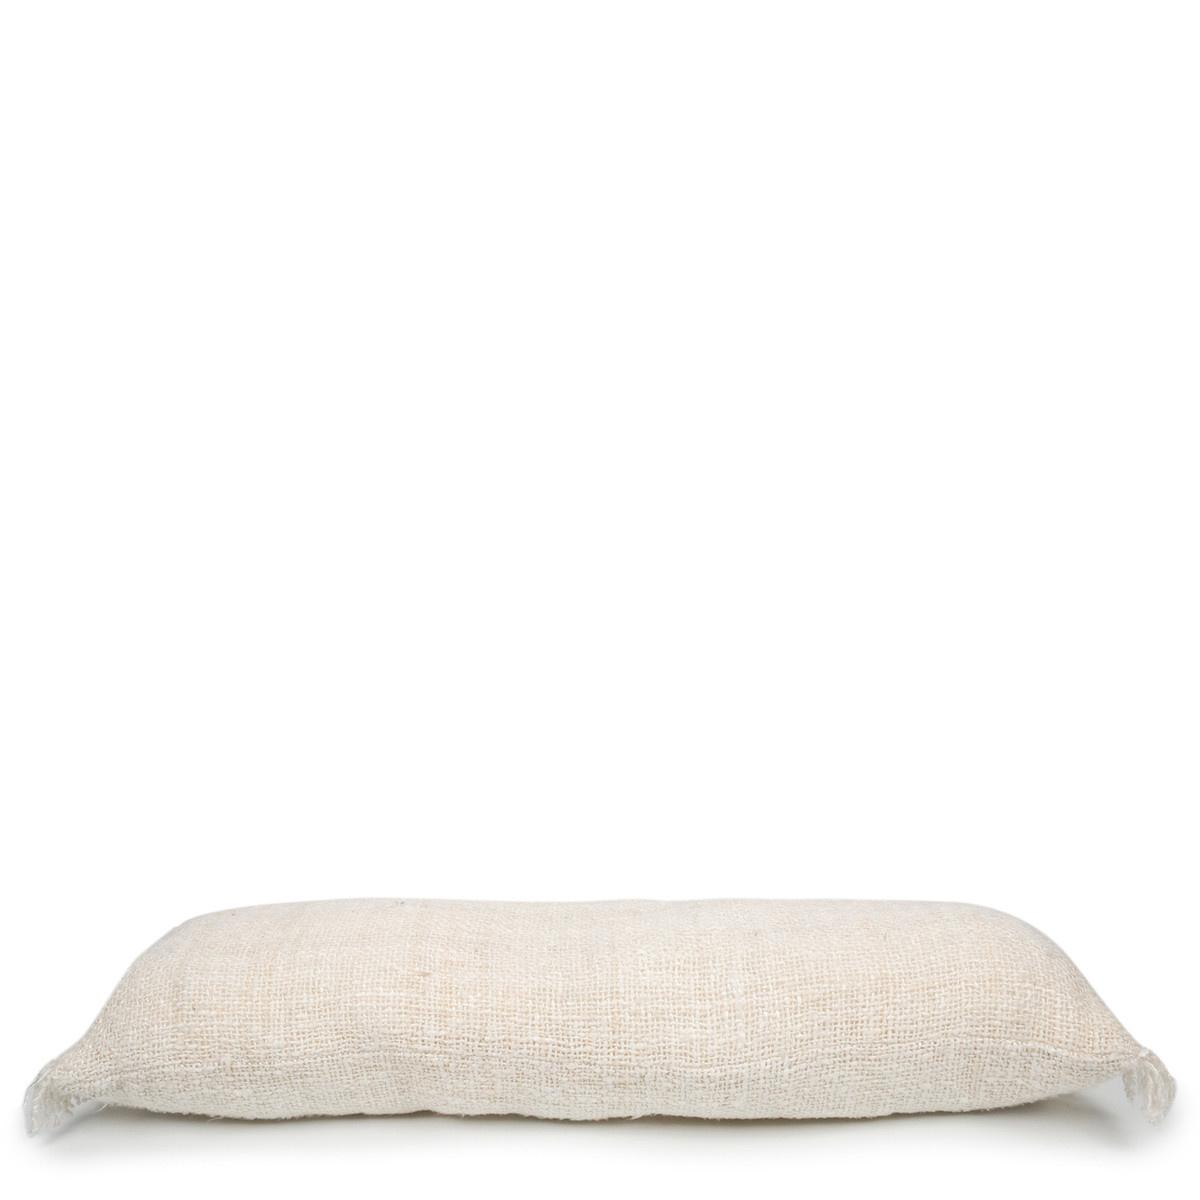 Petite Lily Interiors Cushion Boho - Cream - L100xW35cm